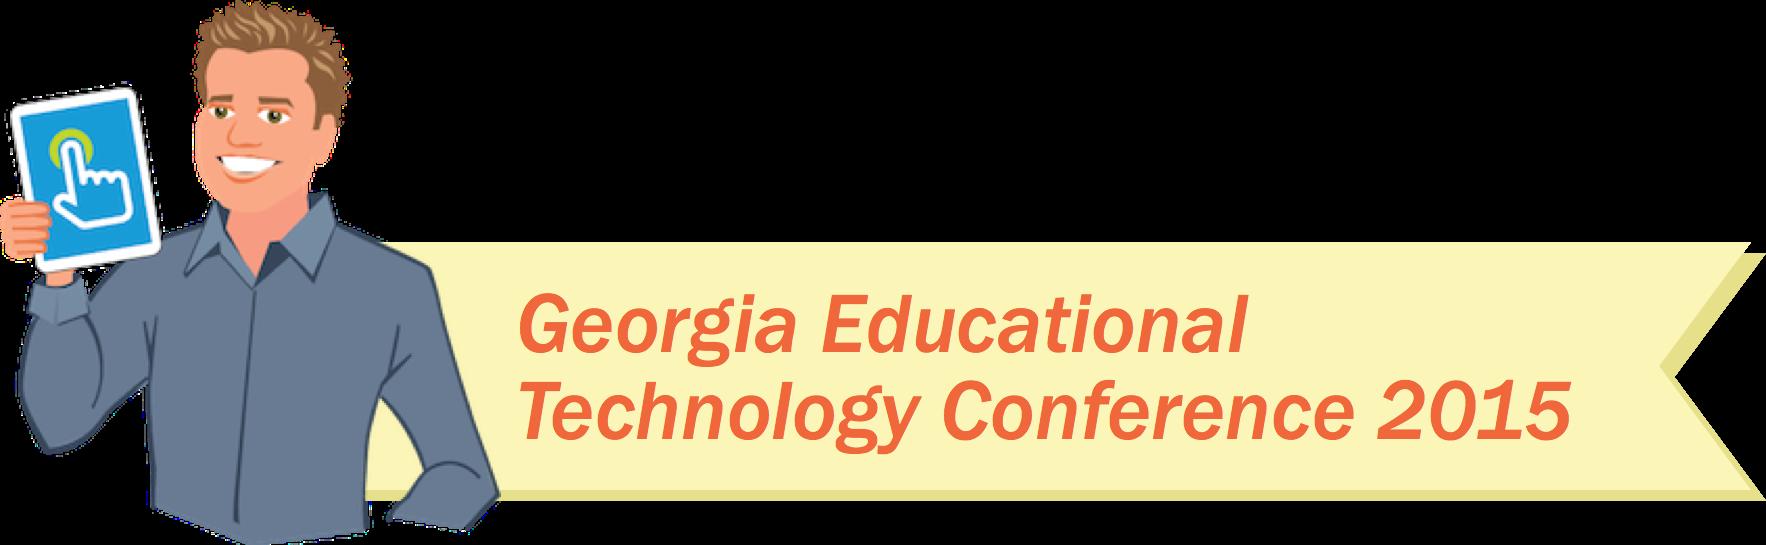 GaETC 2015 Conference